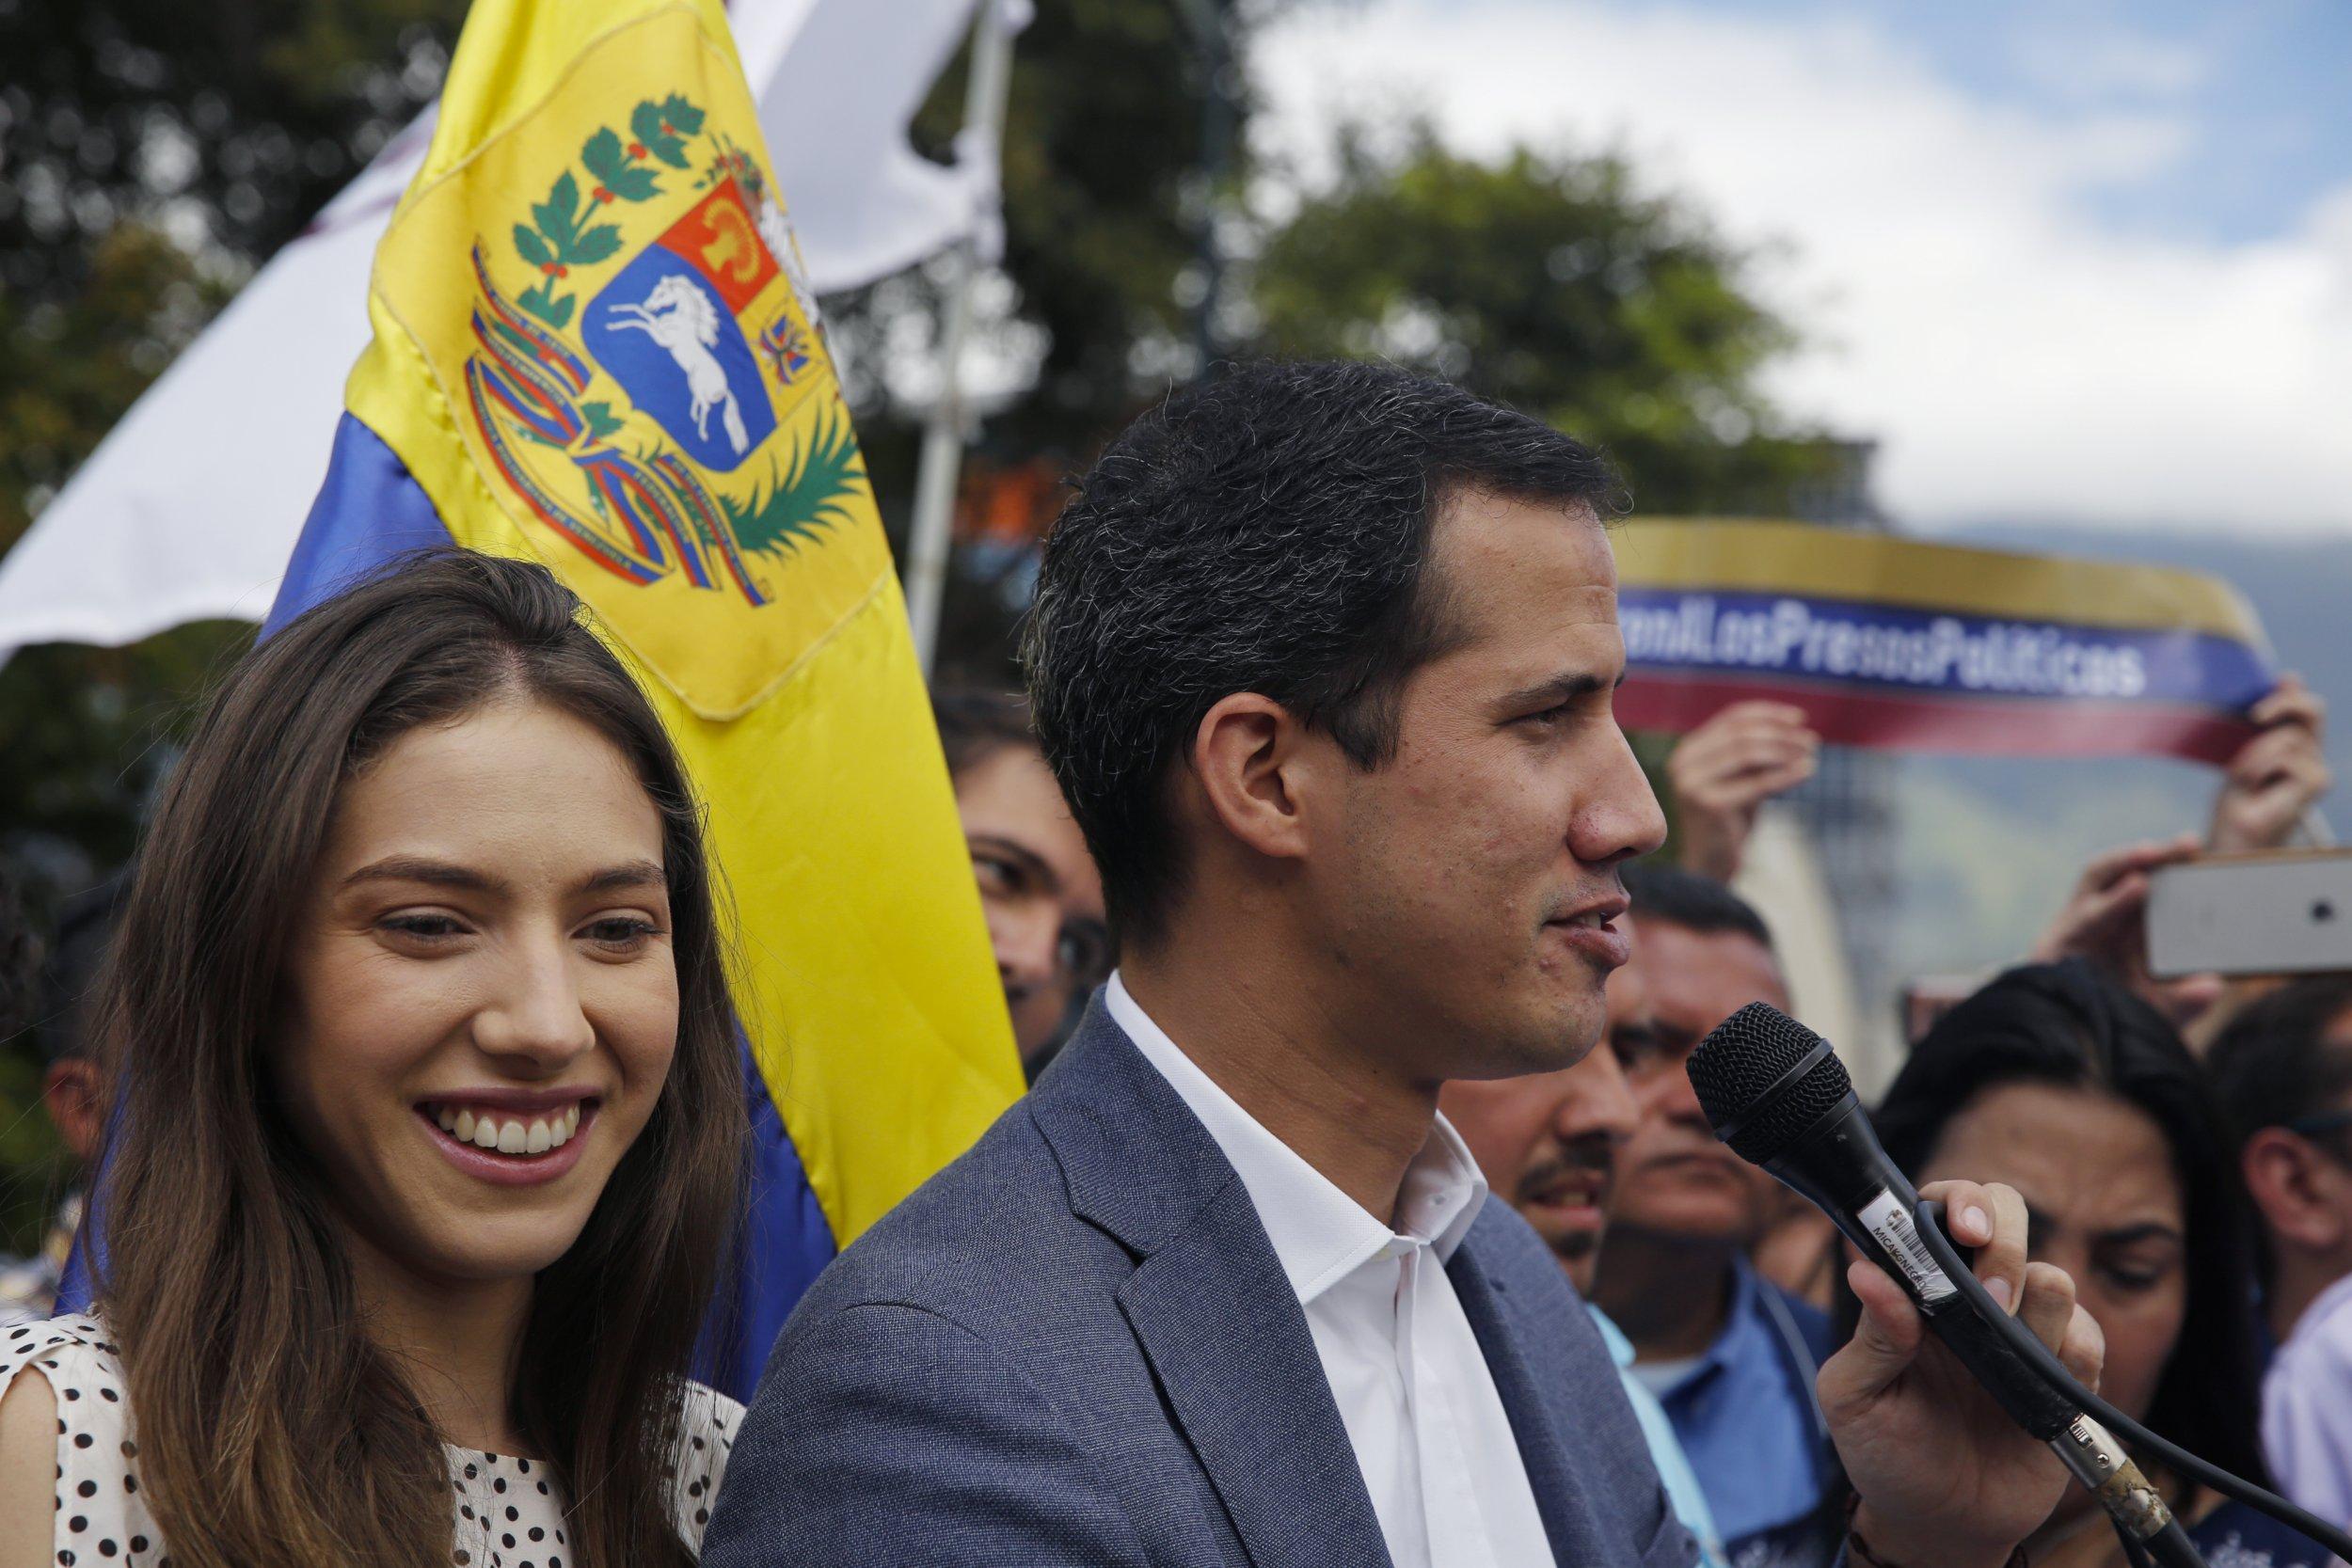 GettyImages-1125150956 Juan Guaido of Venezuela and wife